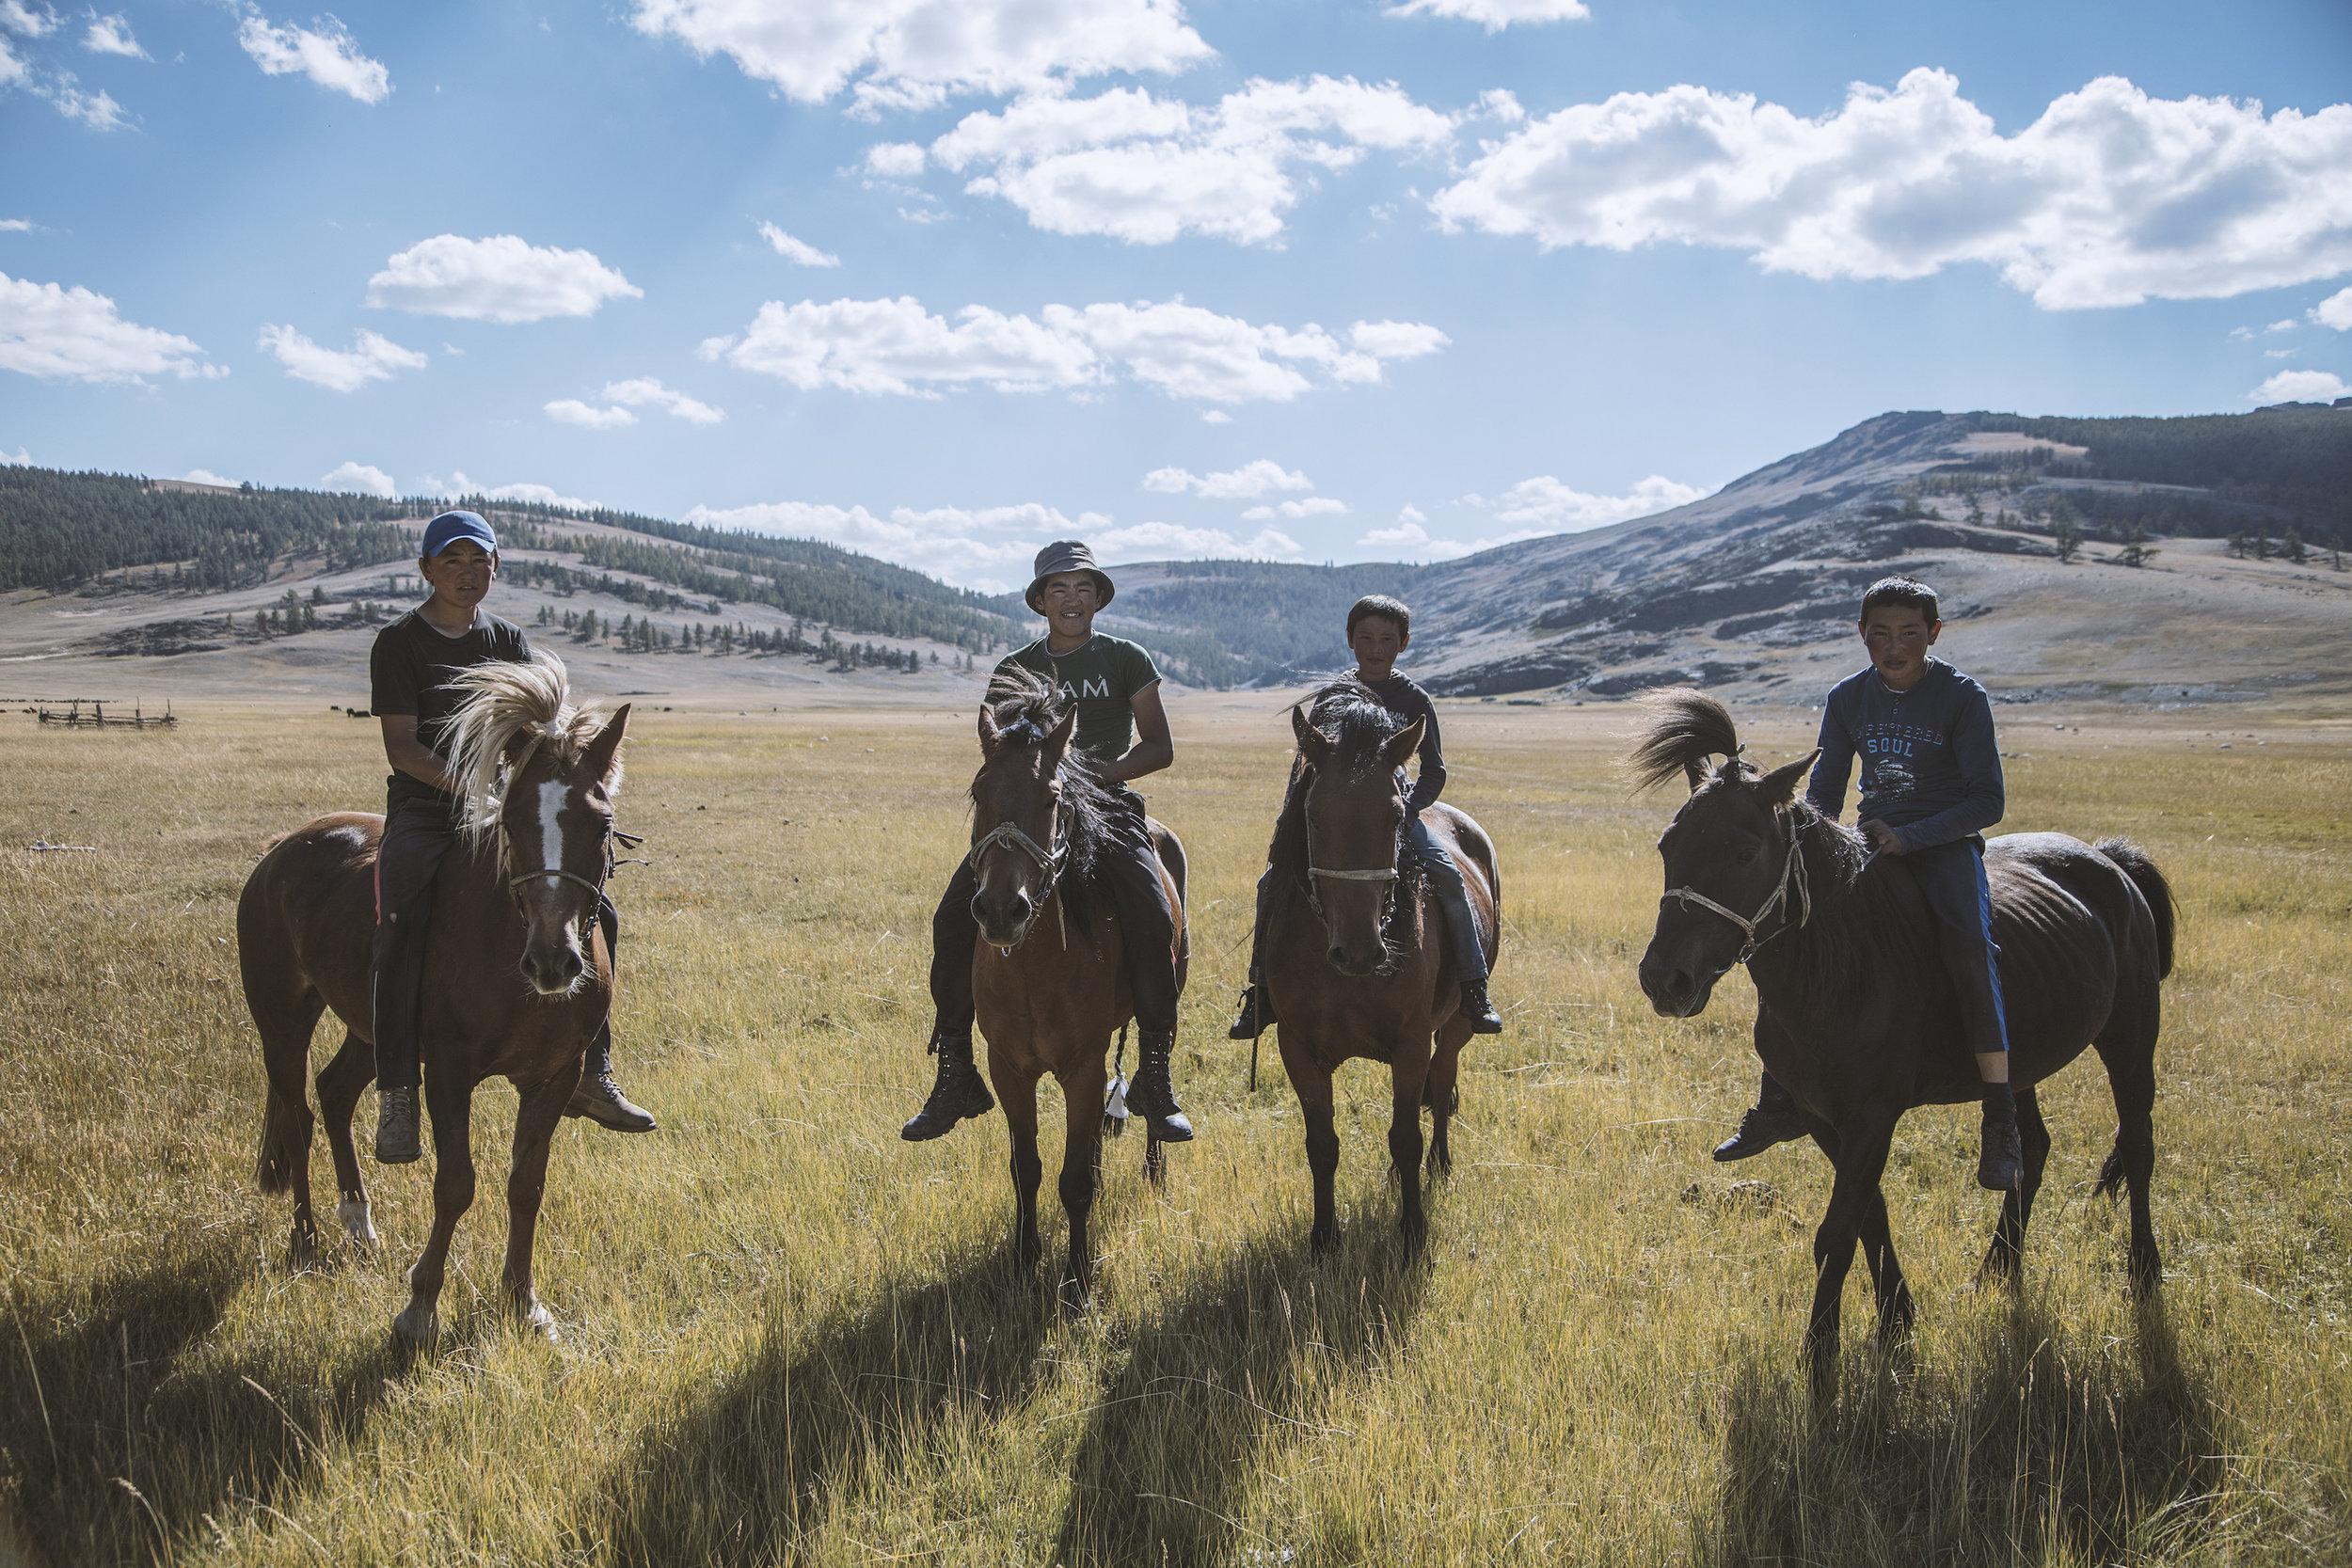 Nomad Kazakh boys in the Altai, Western Mongolia_Boy_Nomad_aAron_Munson.jpg